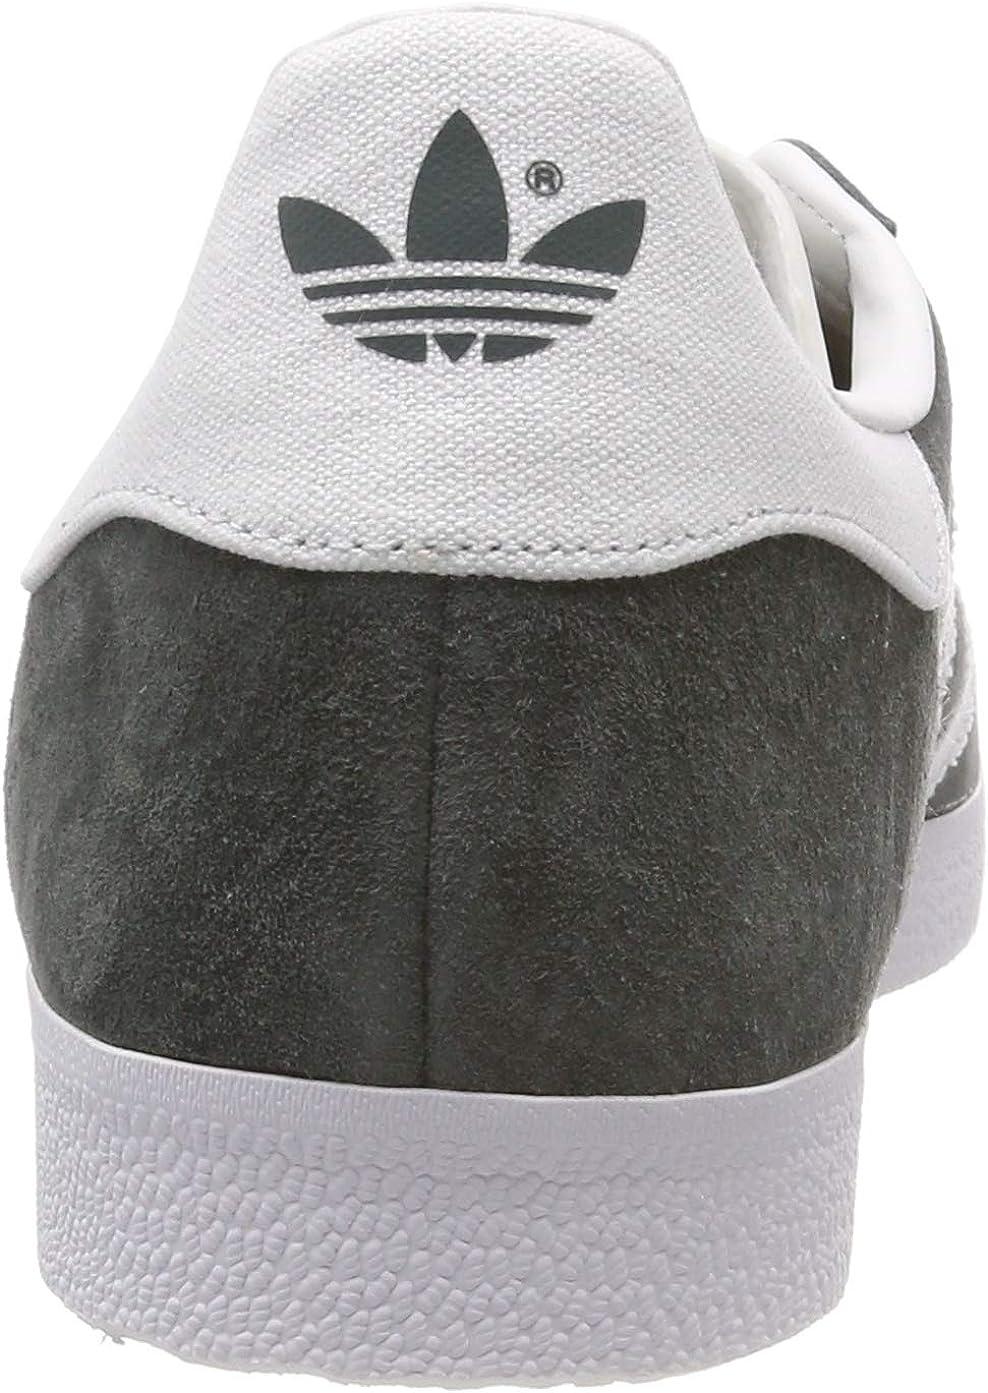 adidas Gazelle Basket Mode Homme